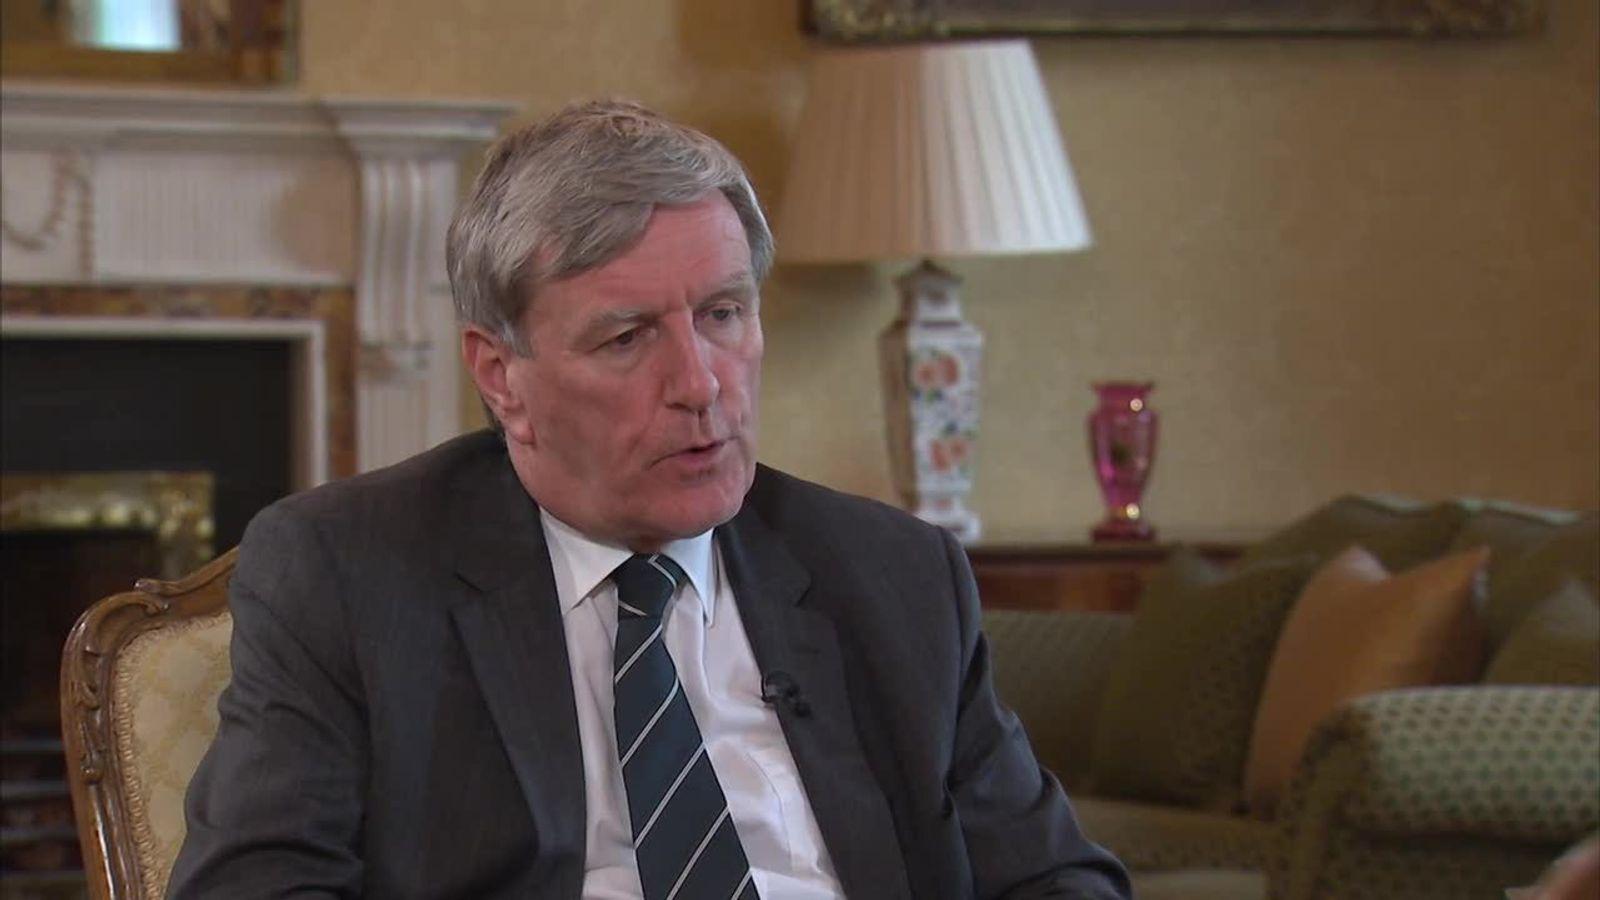 Ireland's UK ambassador Dan Mulhall